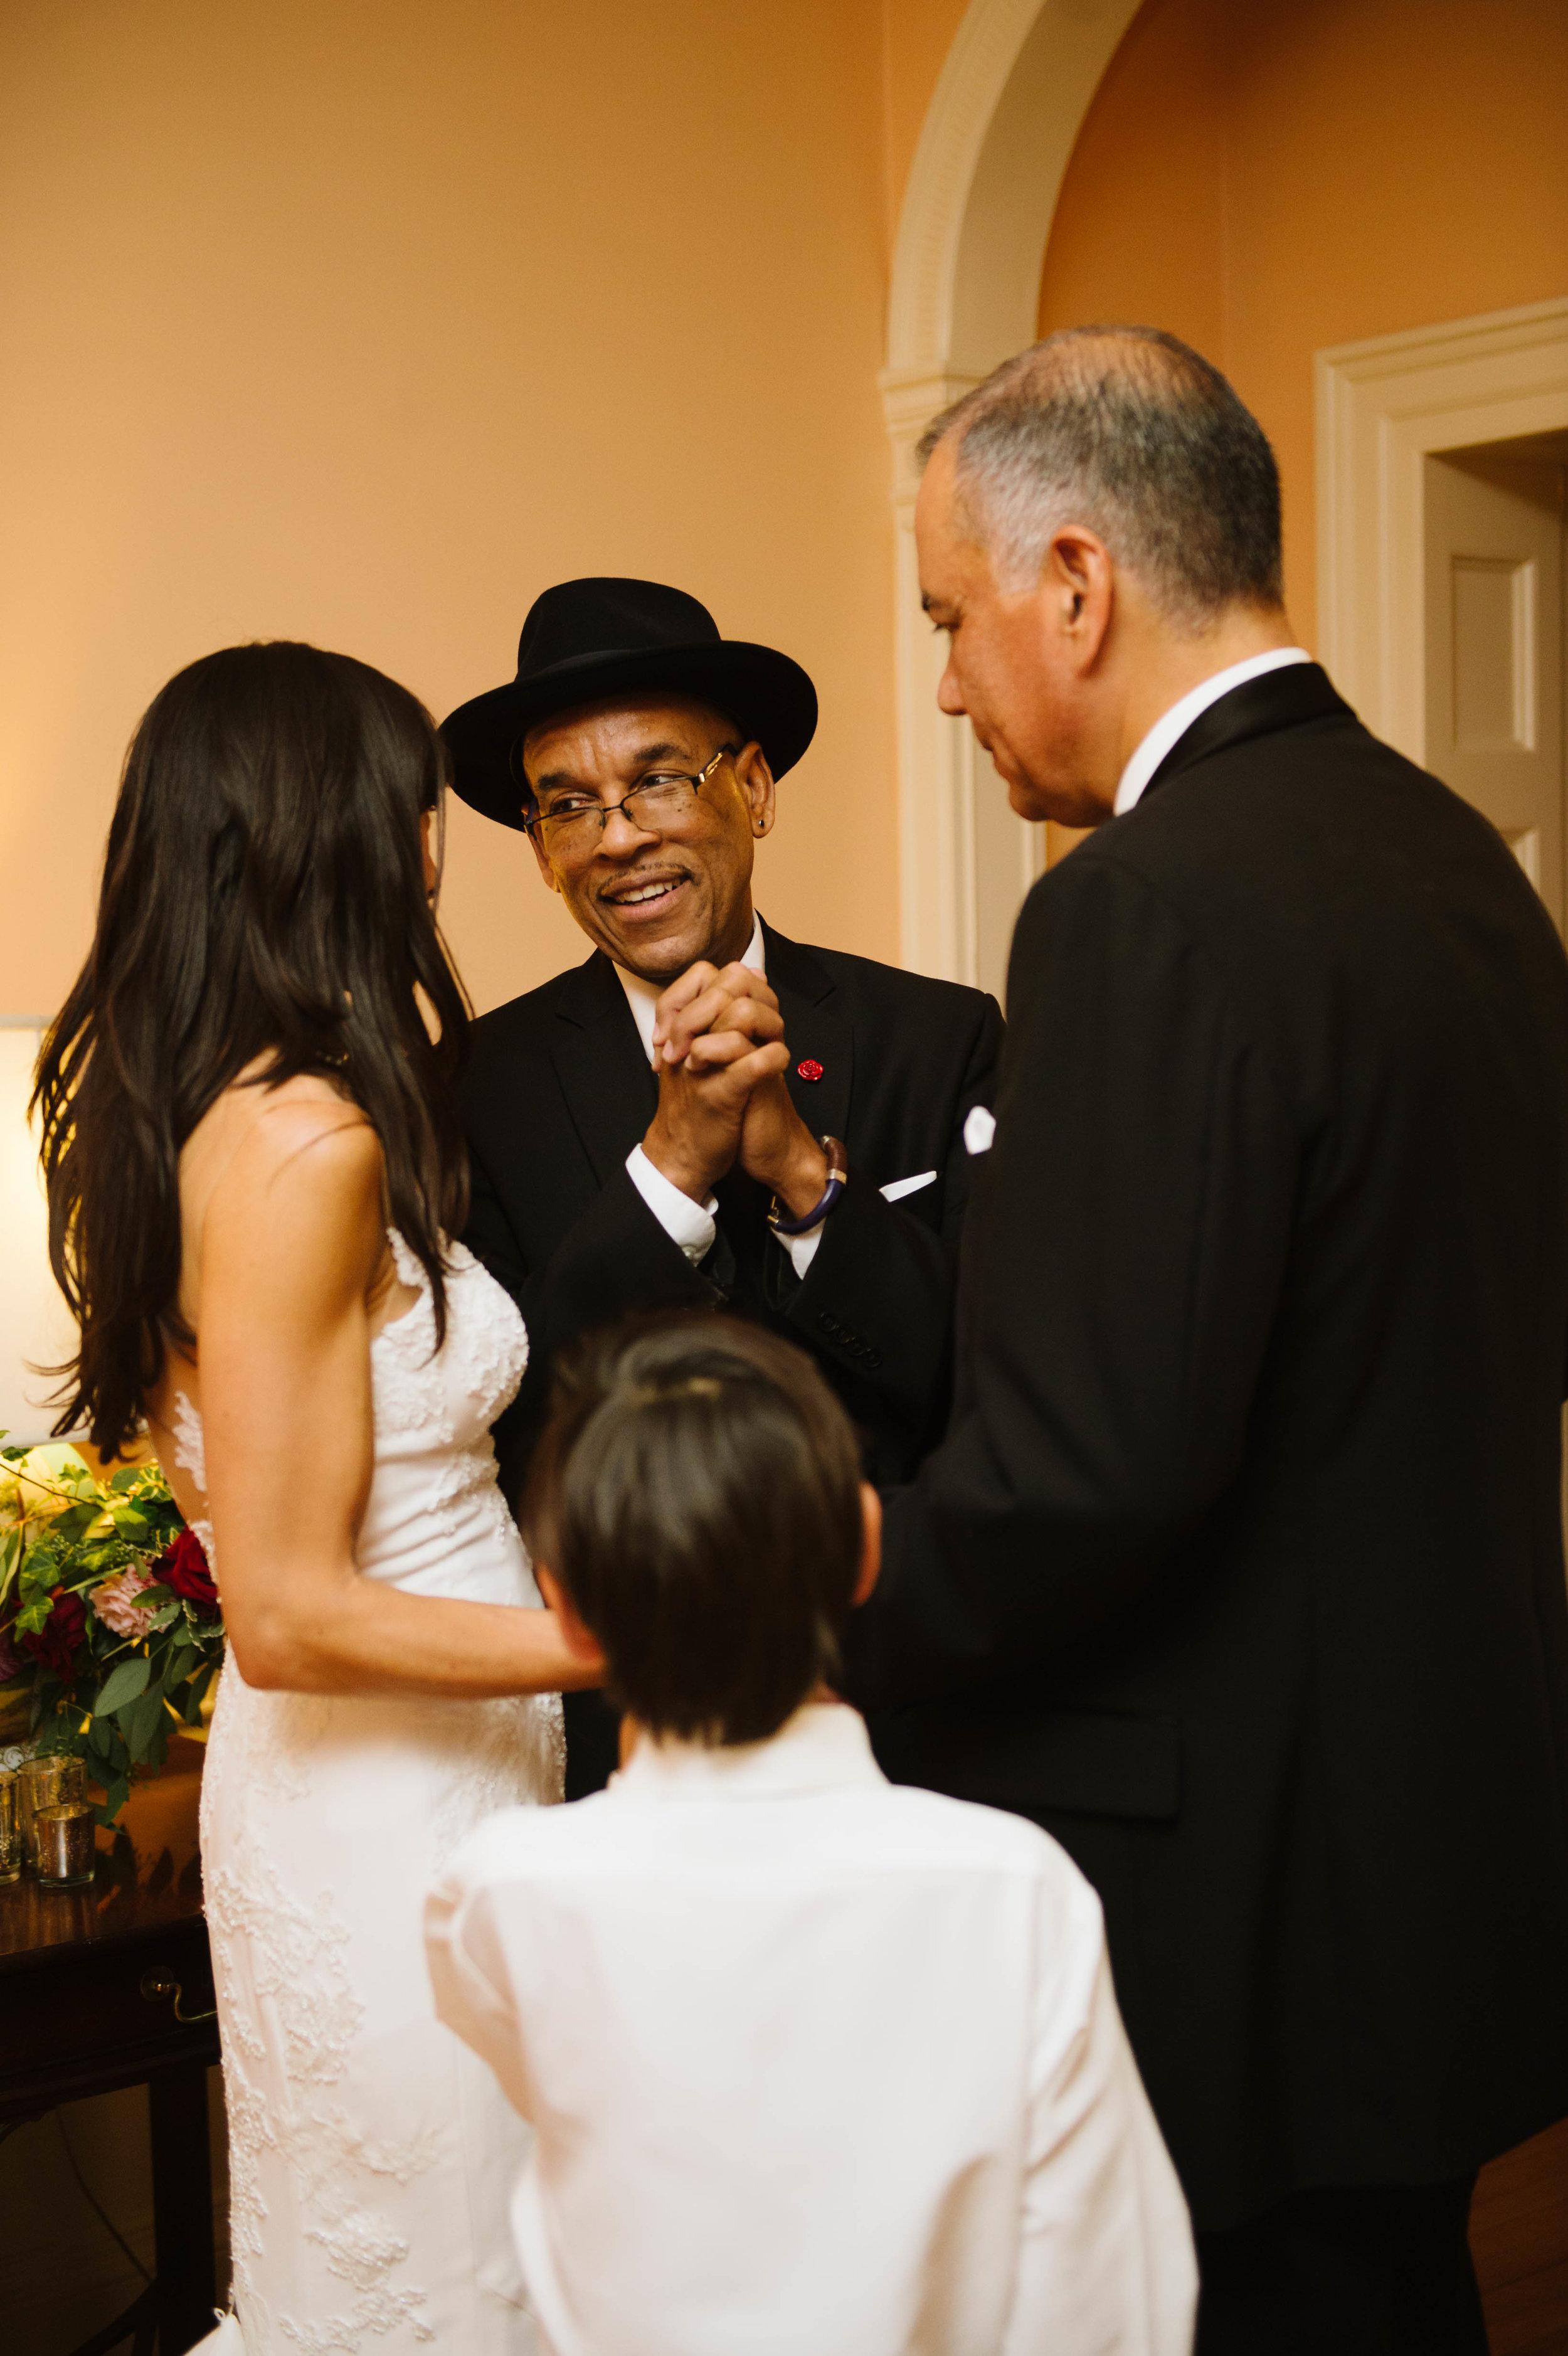 Candid-Wedding-Photography-Boston07.jpg